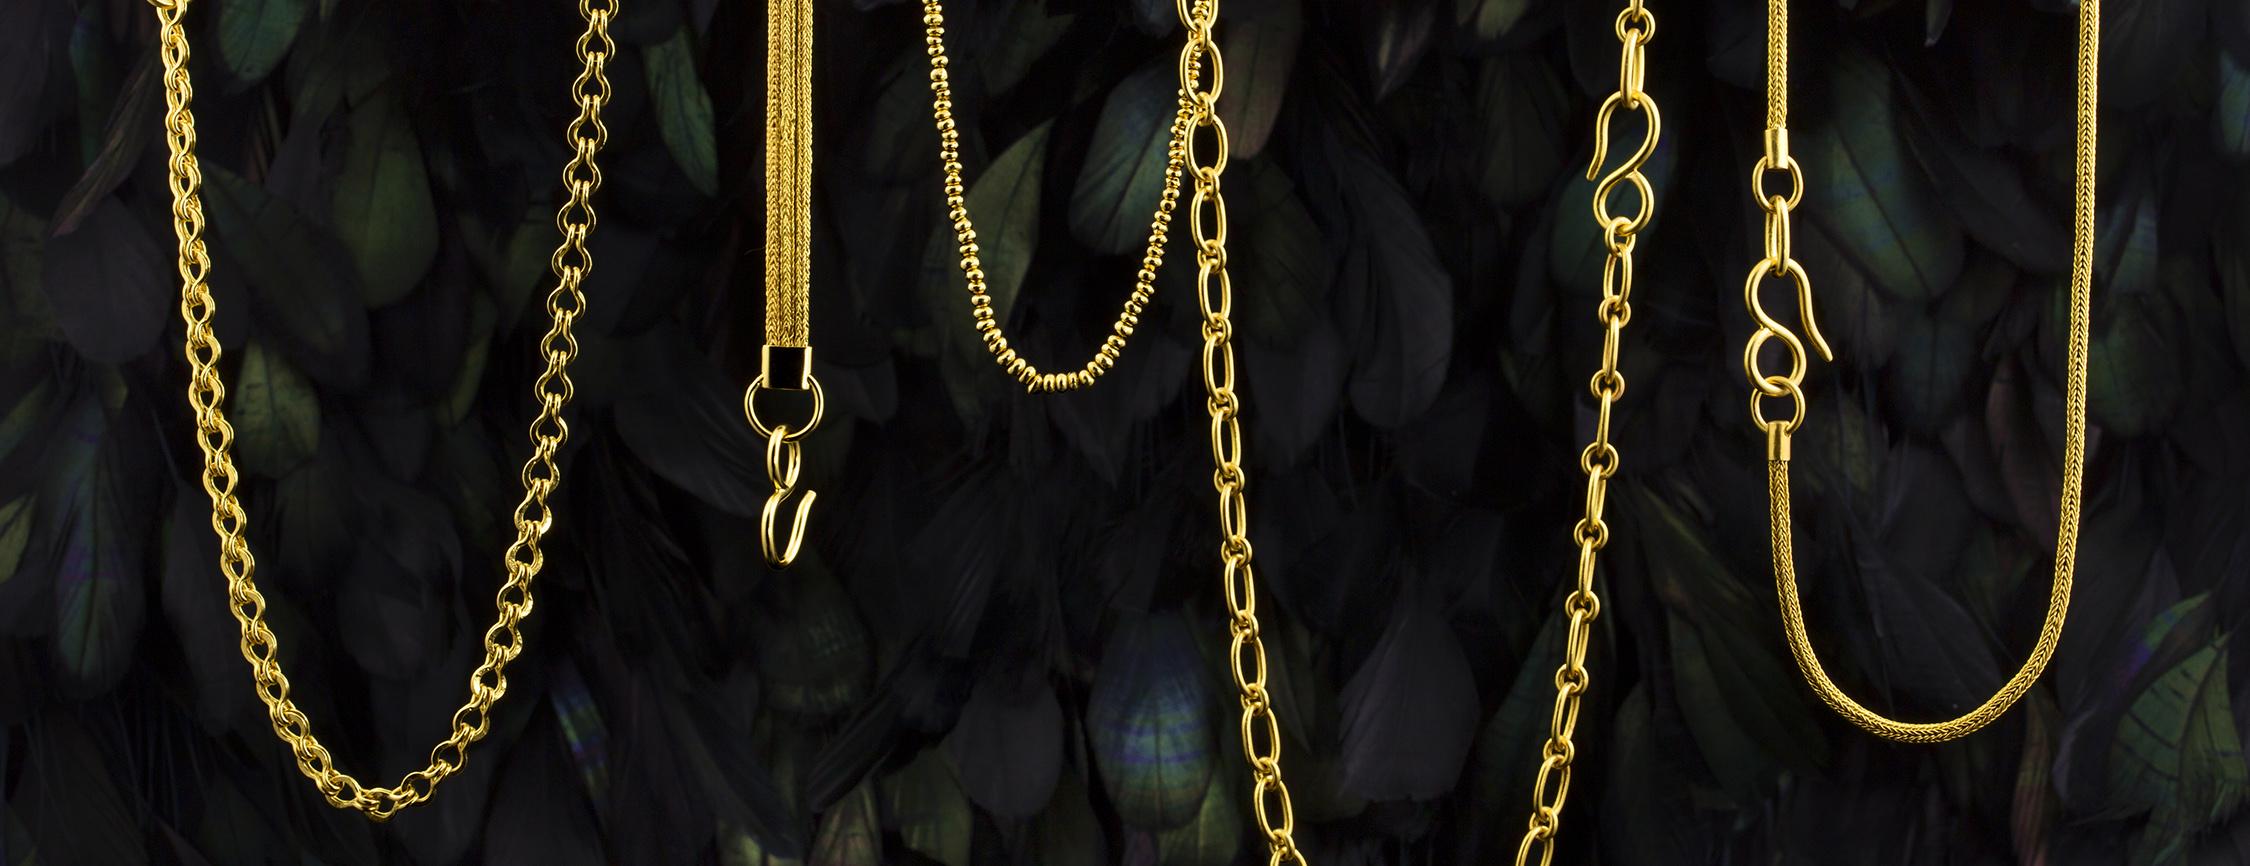 Loren Nicole 22ct gold chains